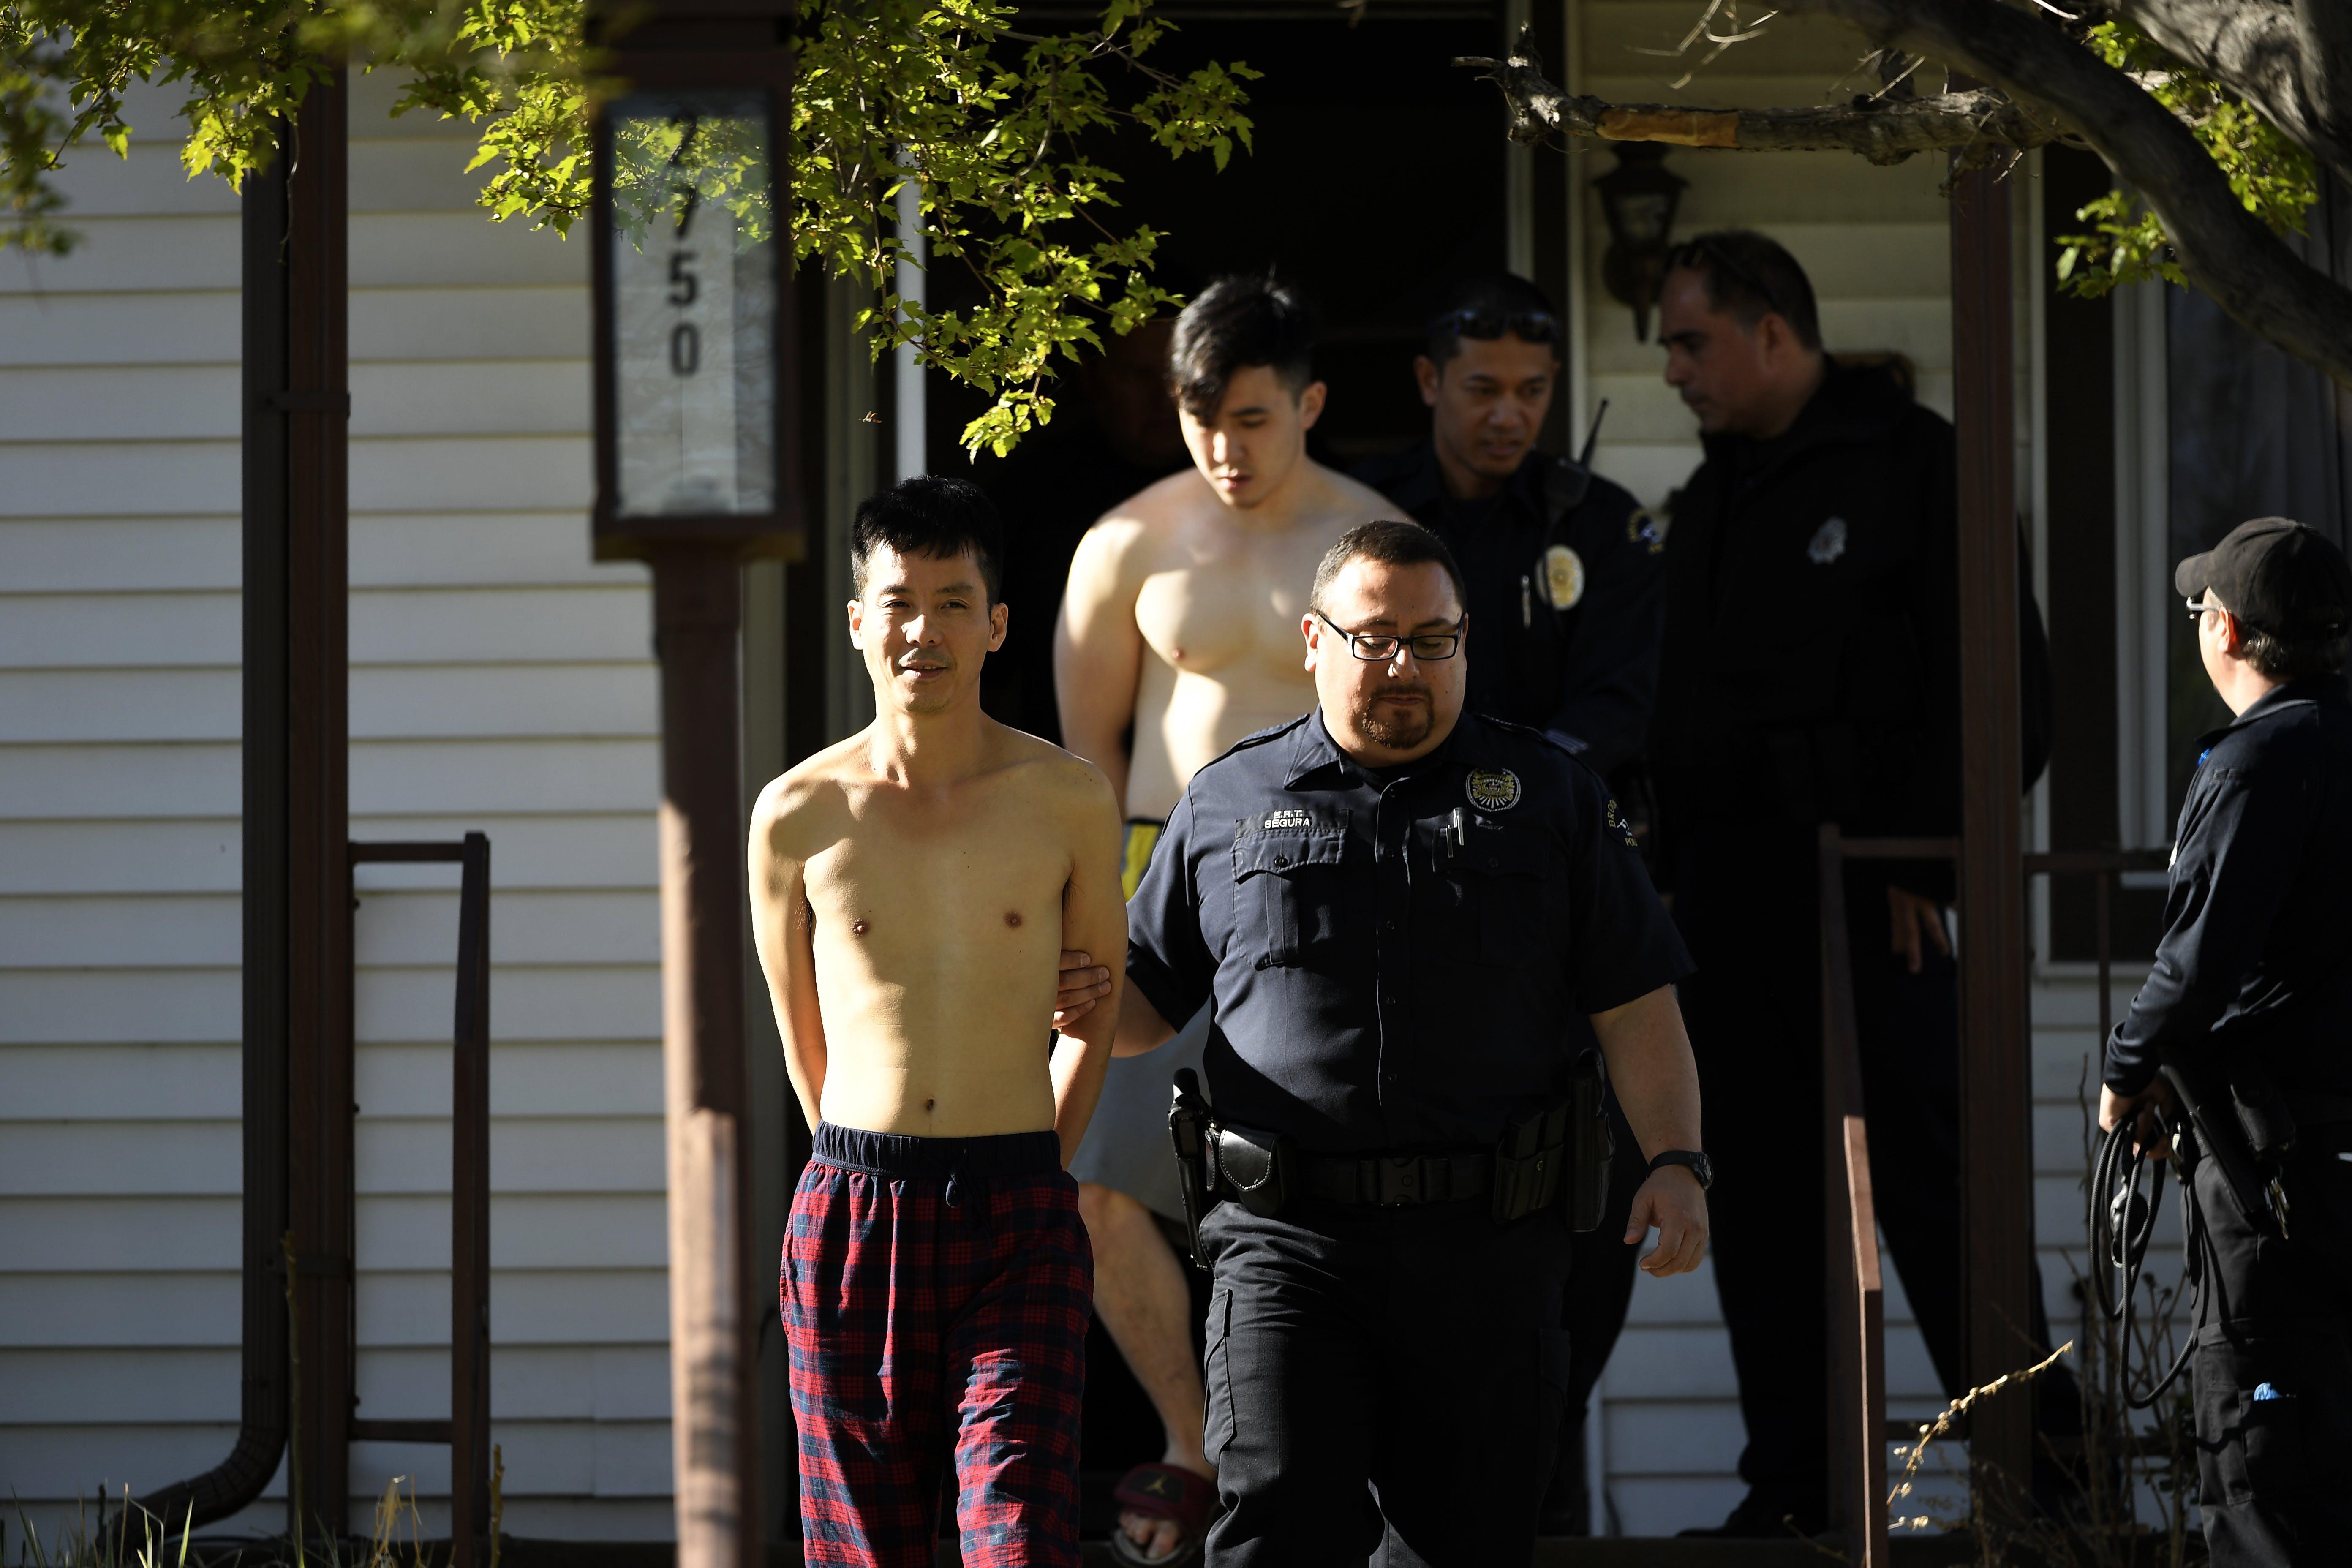 Weird weed arrests